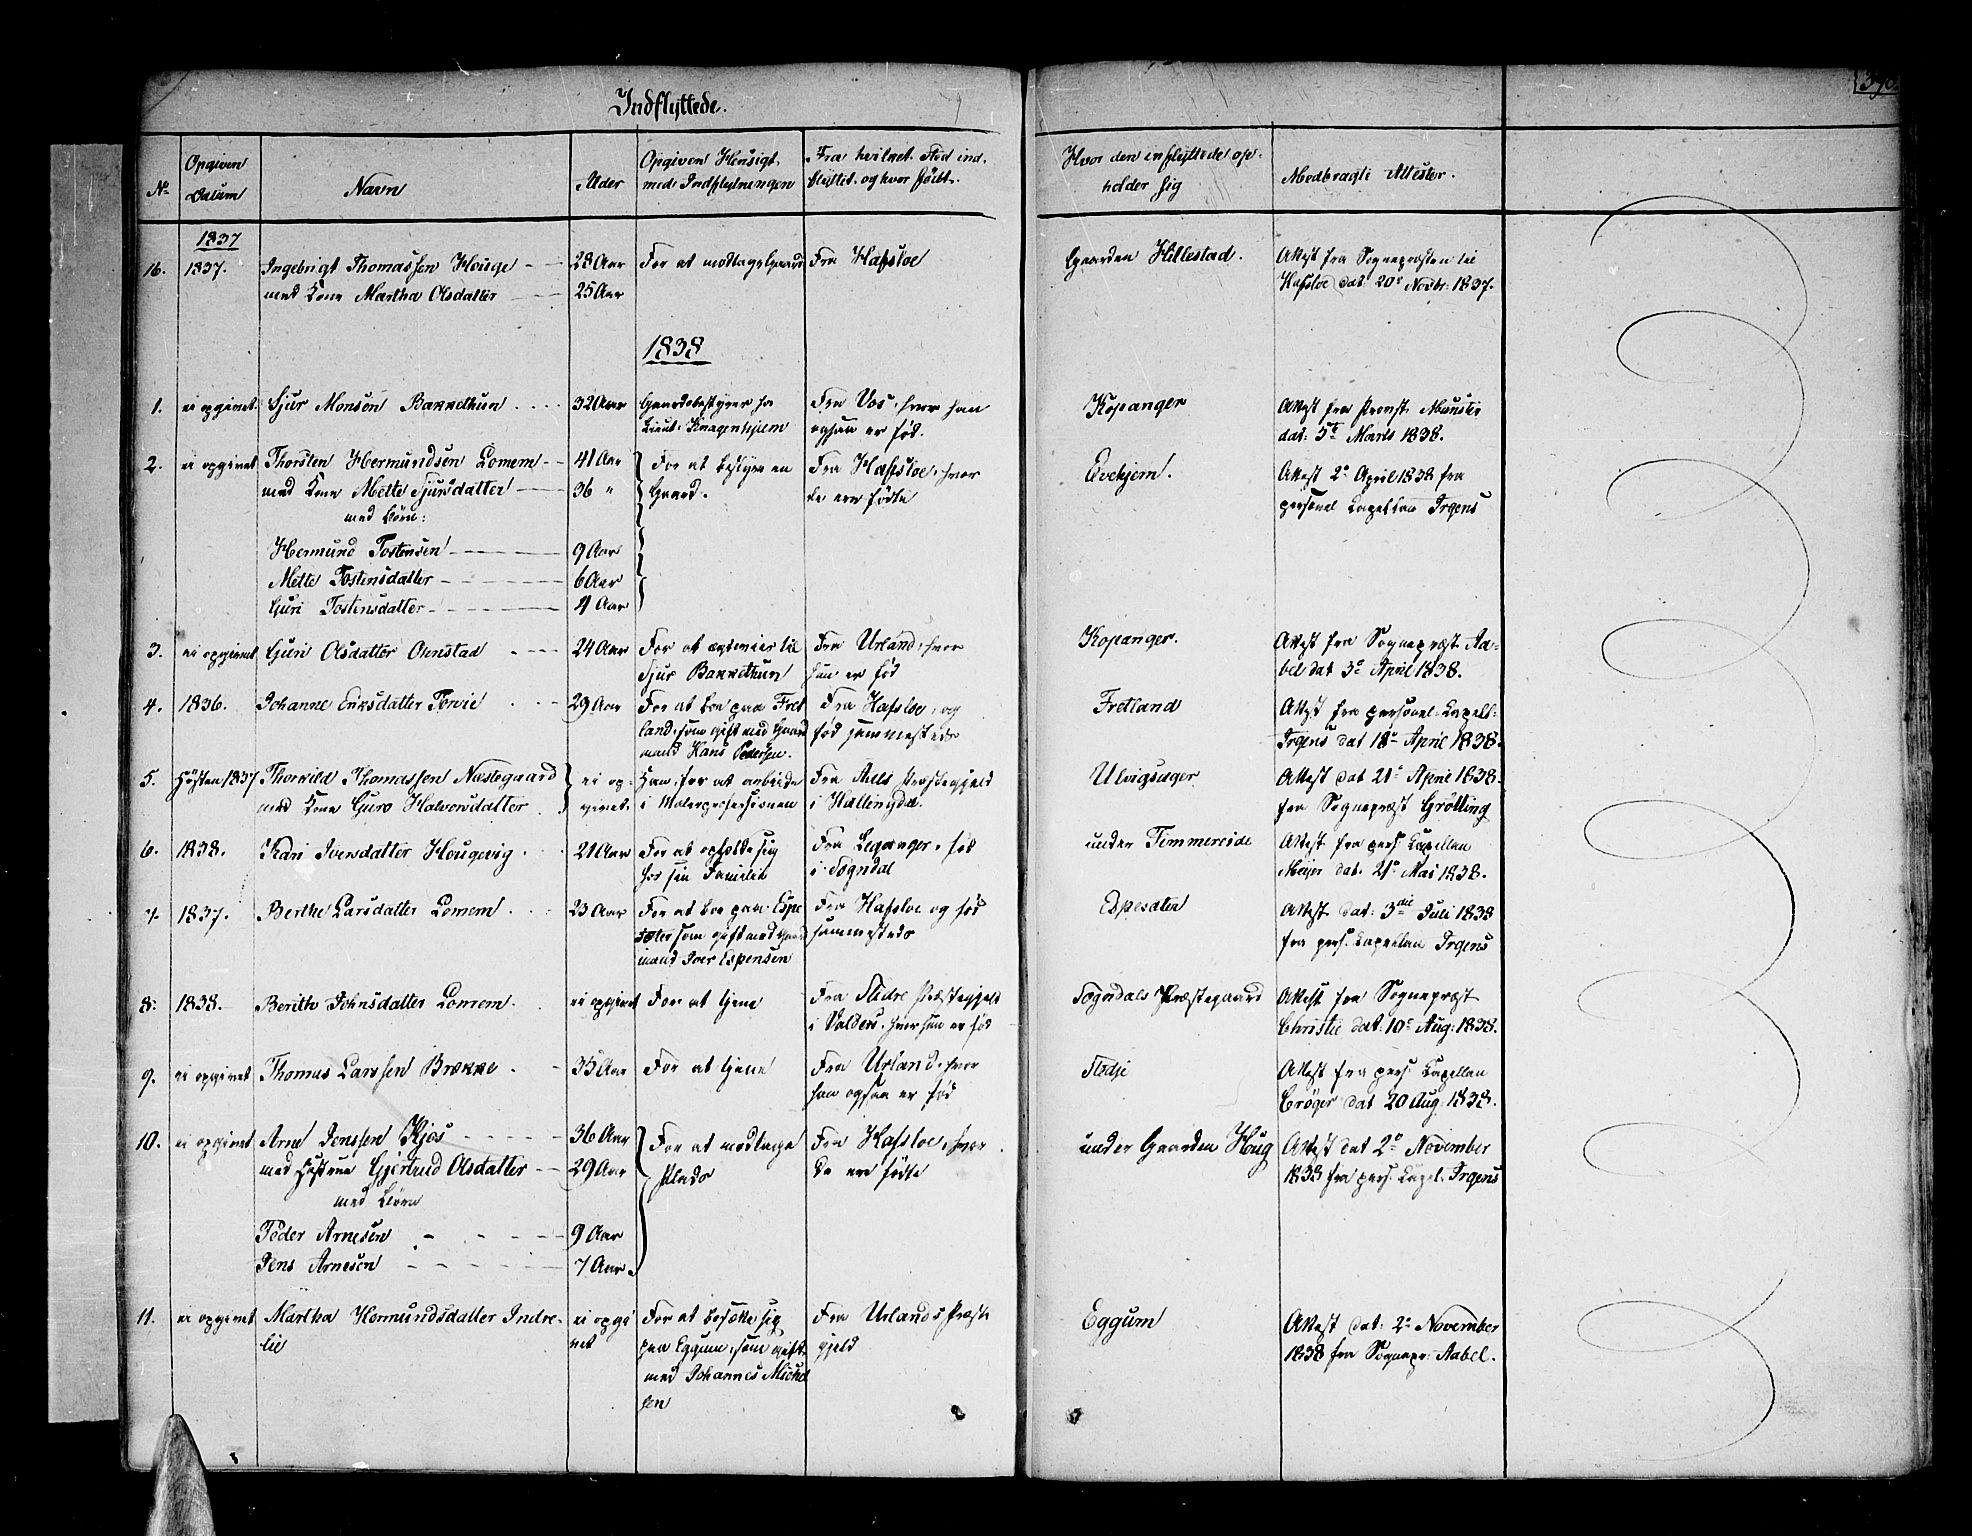 SAB, Sogndal Sokneprestembete, H/Haa/Haaa/L0010: Ministerialbok nr. A 10, 1821-1838, s. 398